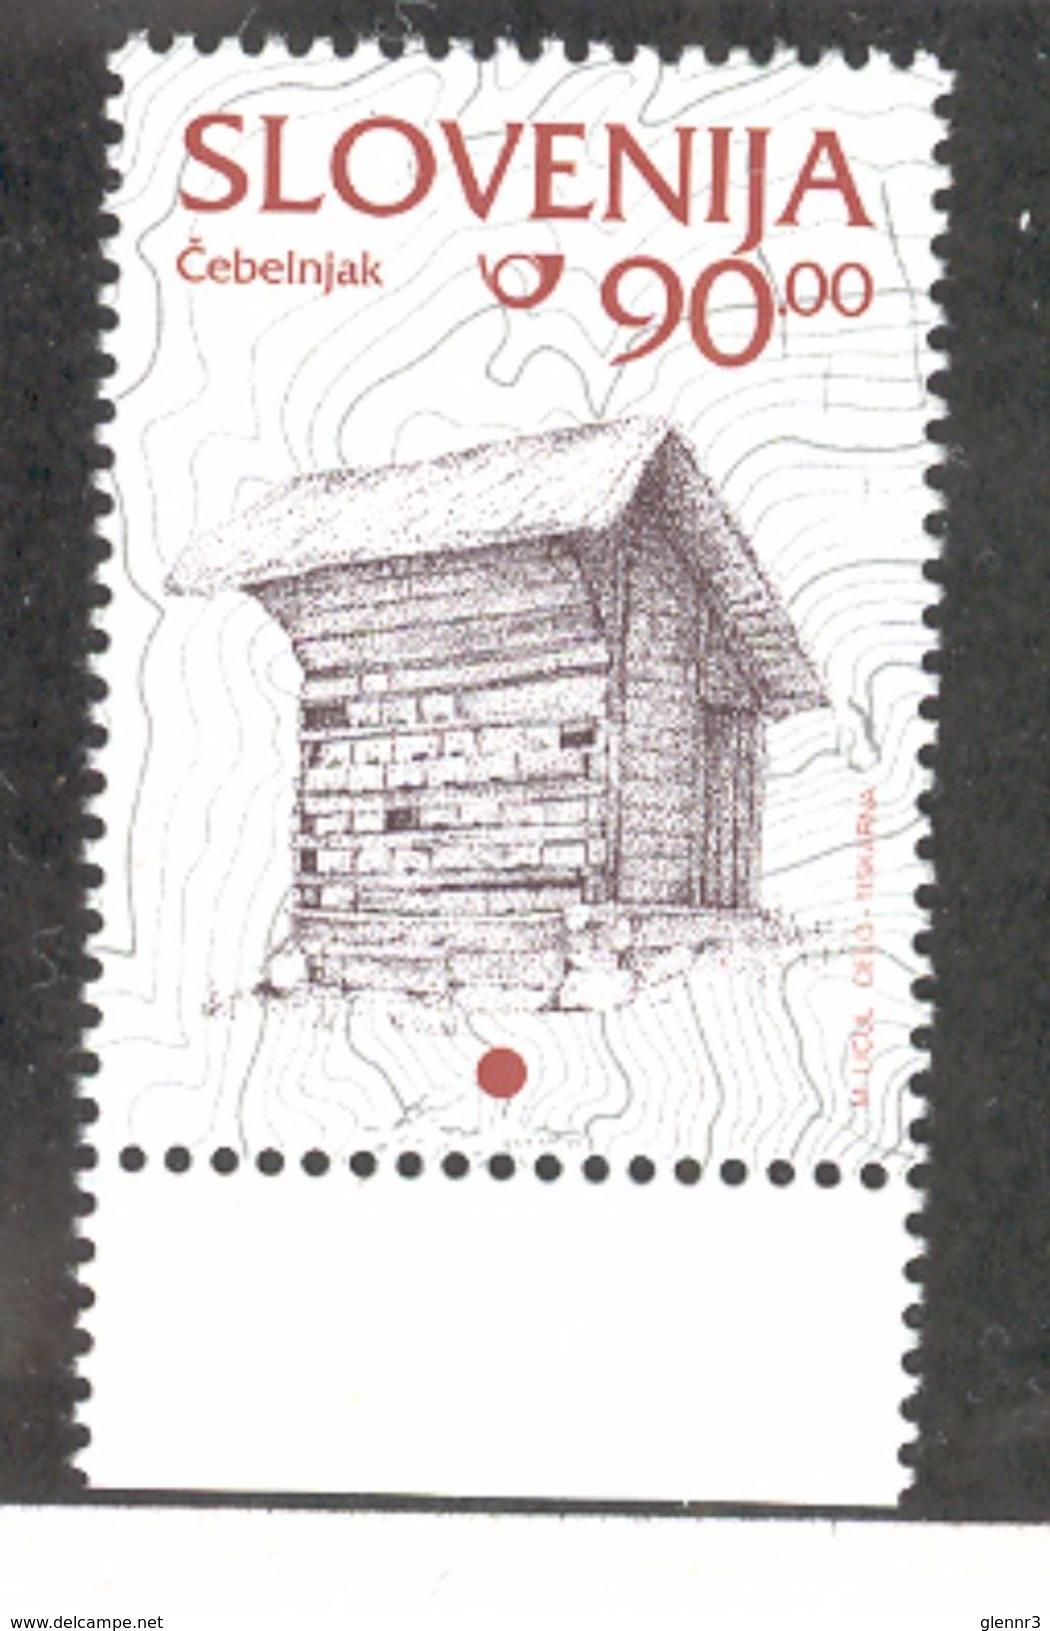 SLOVENIA 1997 Beehive 90t Definitive, Scott Catalogue No. 216 MNH - Slovenia